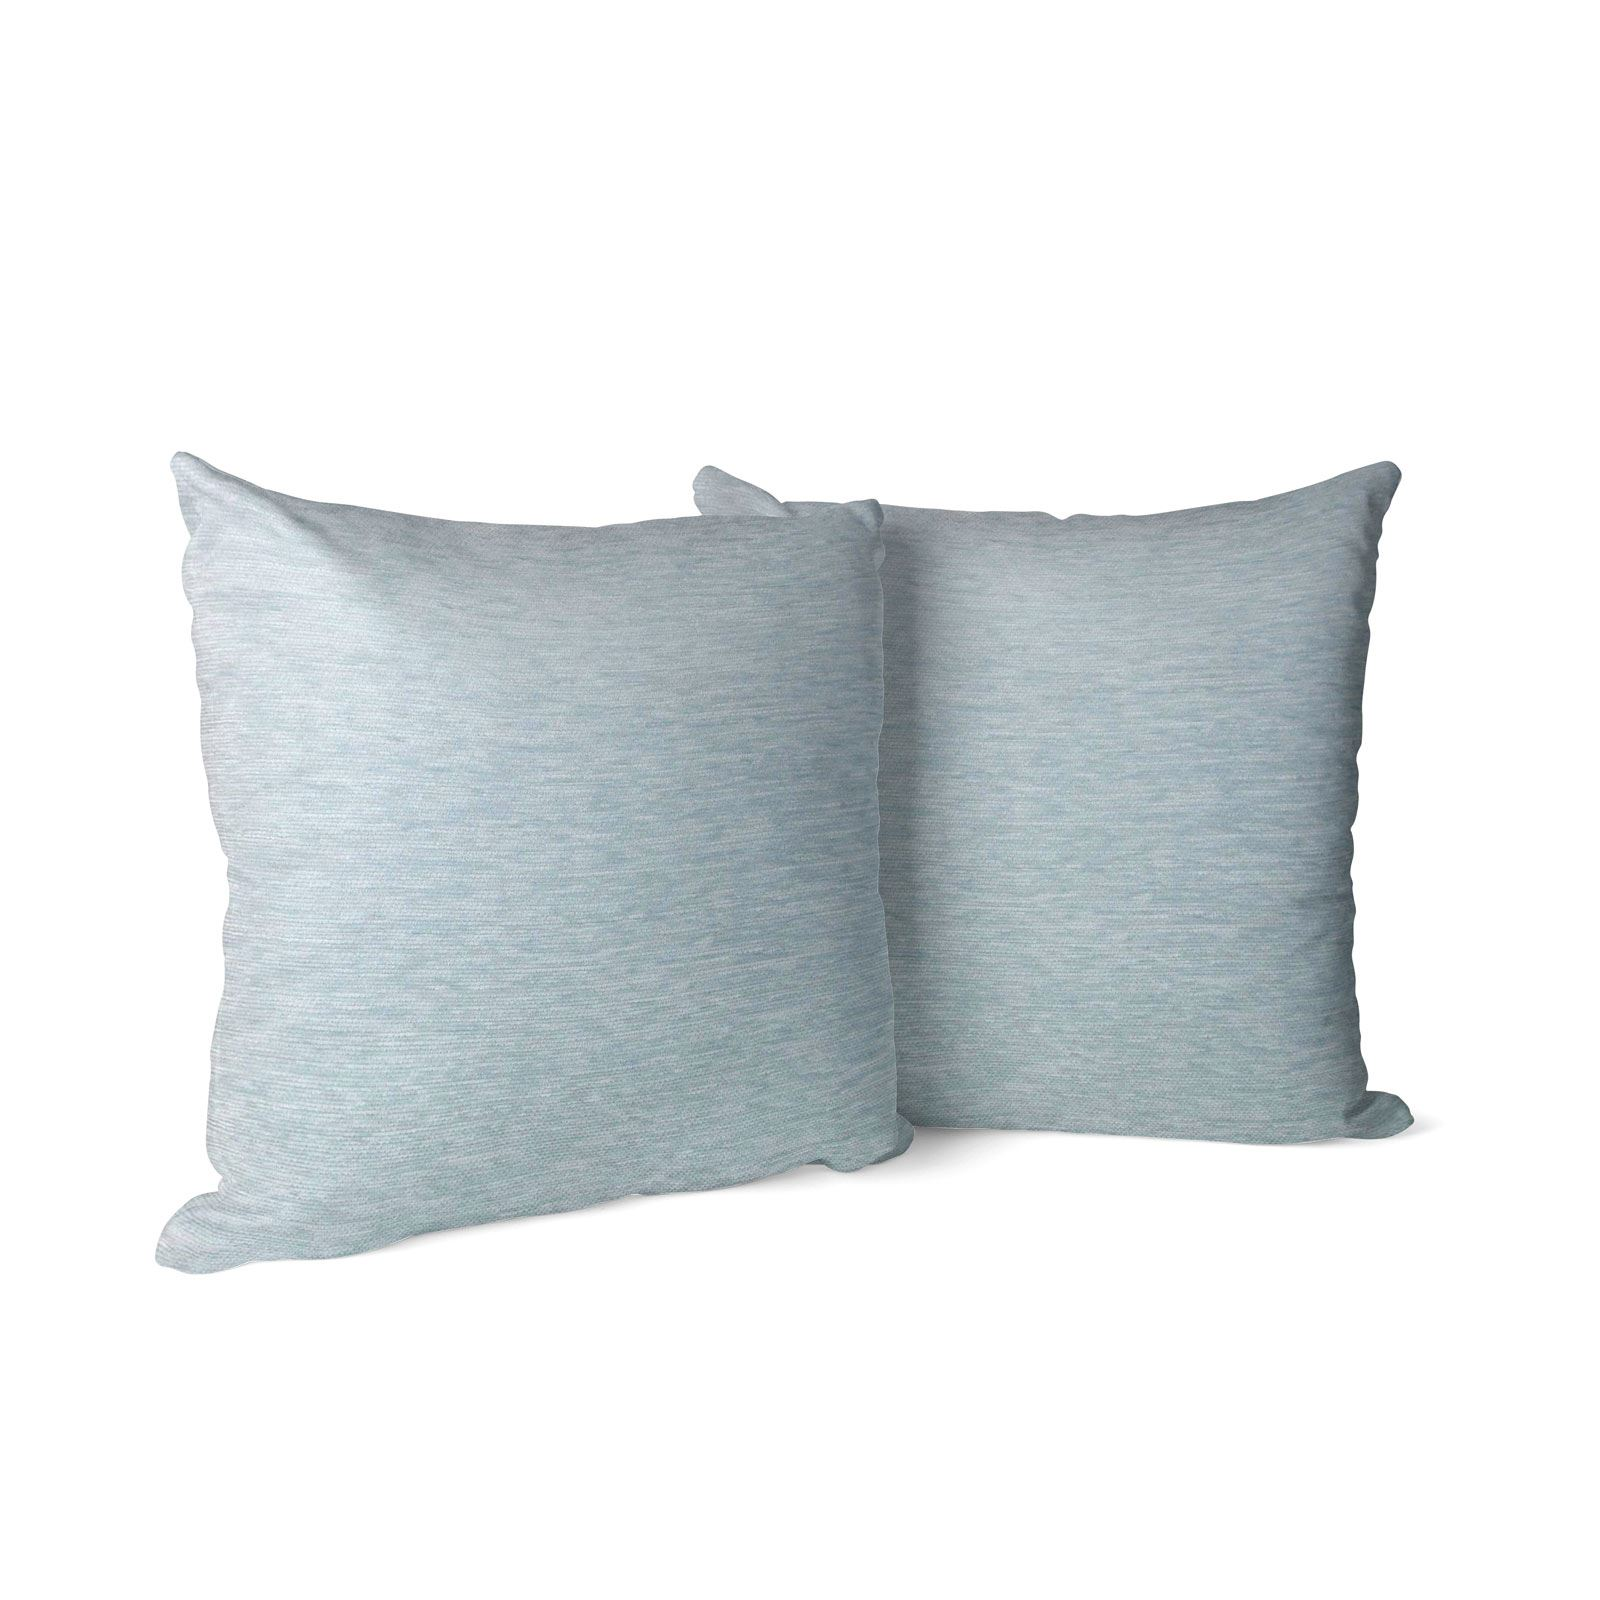 Set-of-2-Chenille-Cushion-Covers-Luxury-Plain-Cushions-Cover-Pairs-18-034-x-18-034 thumbnail 28